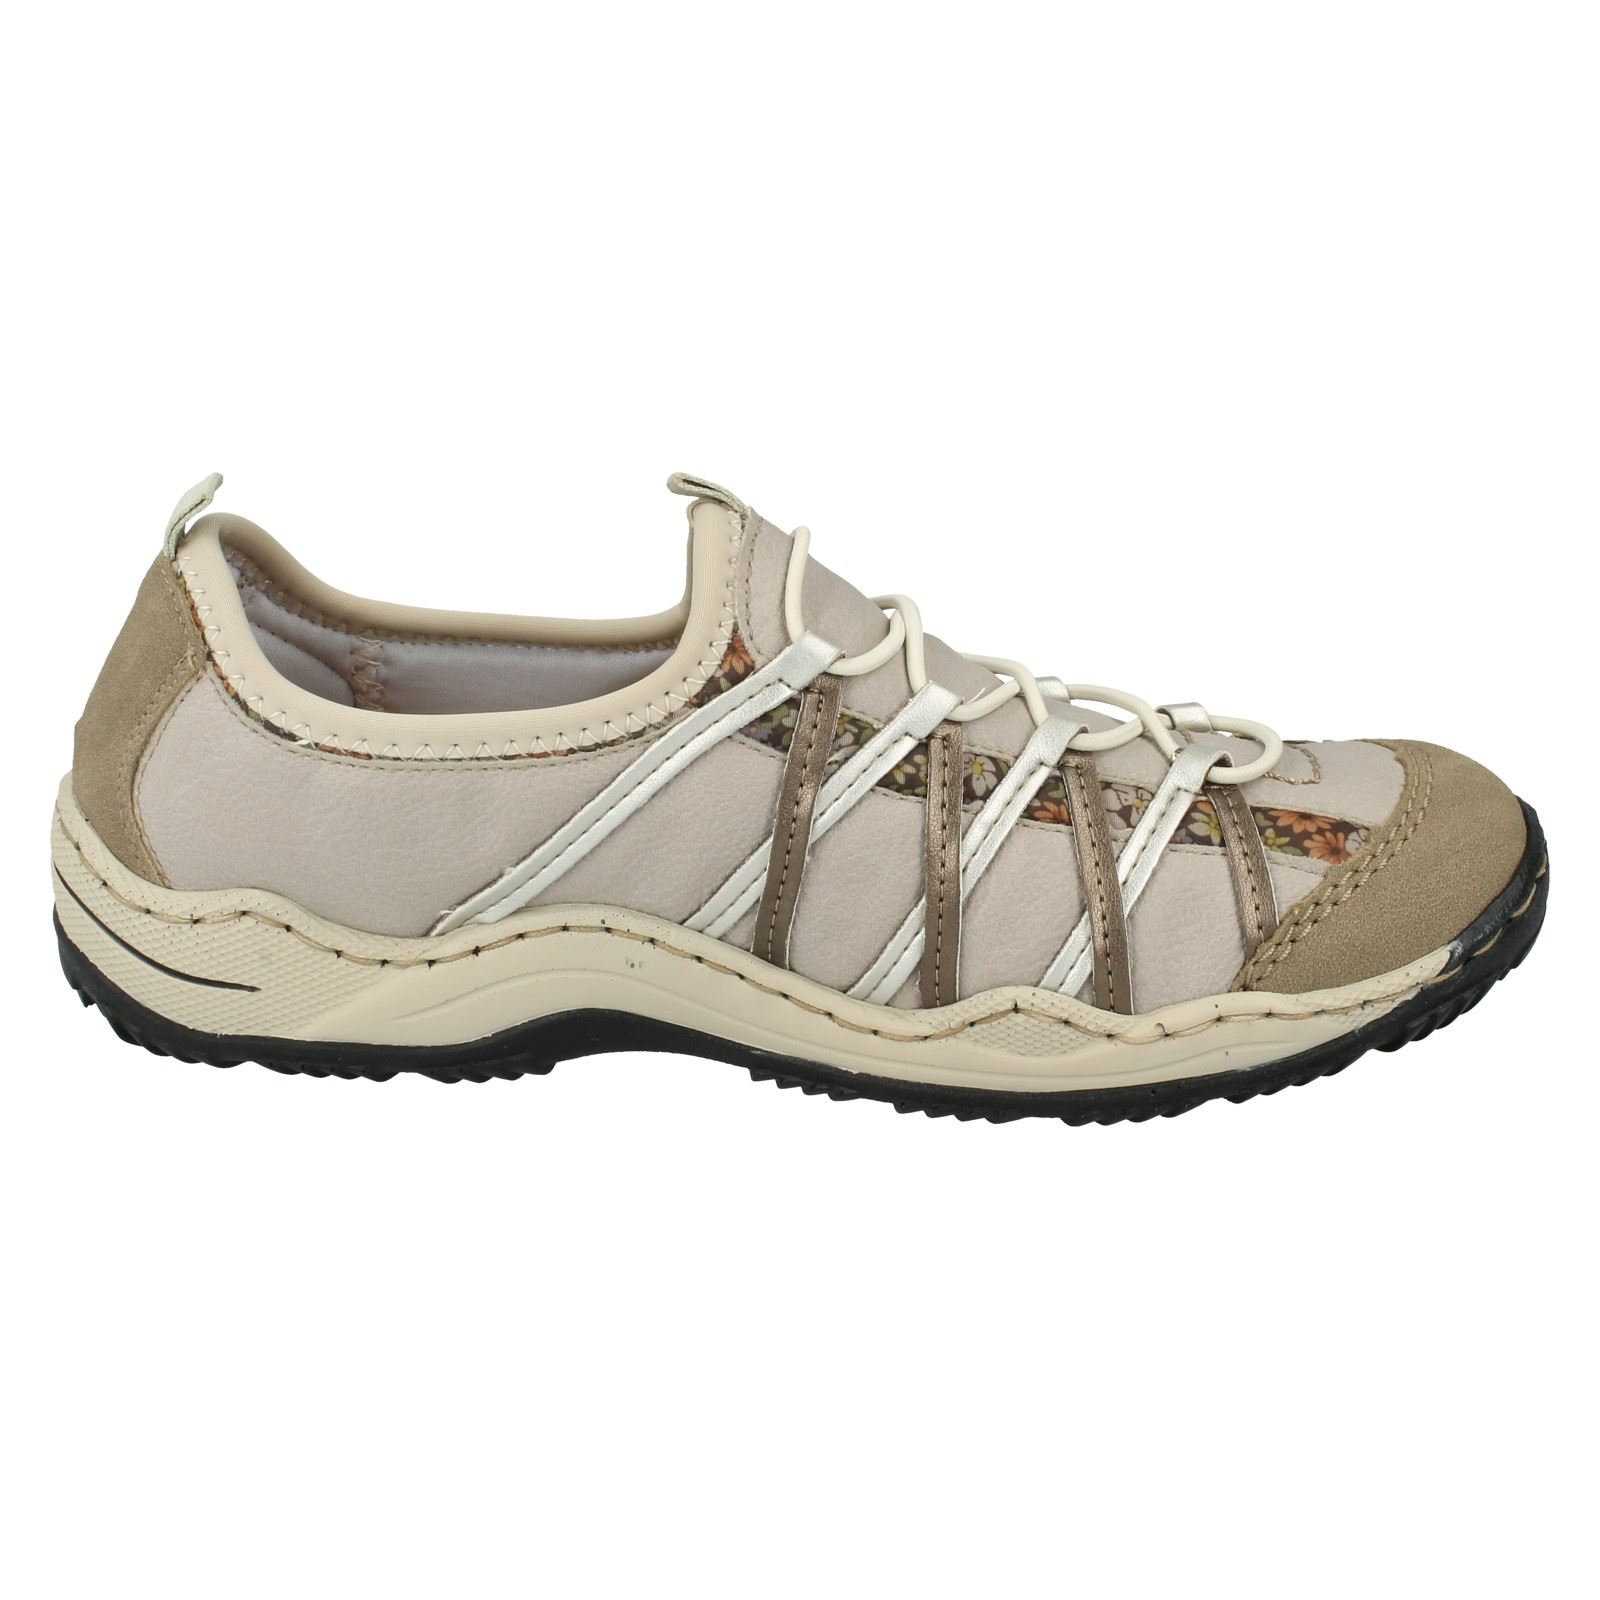 Damenschuhe Rieker Rieker Rieker Schuhe sportive l0563 93ddac